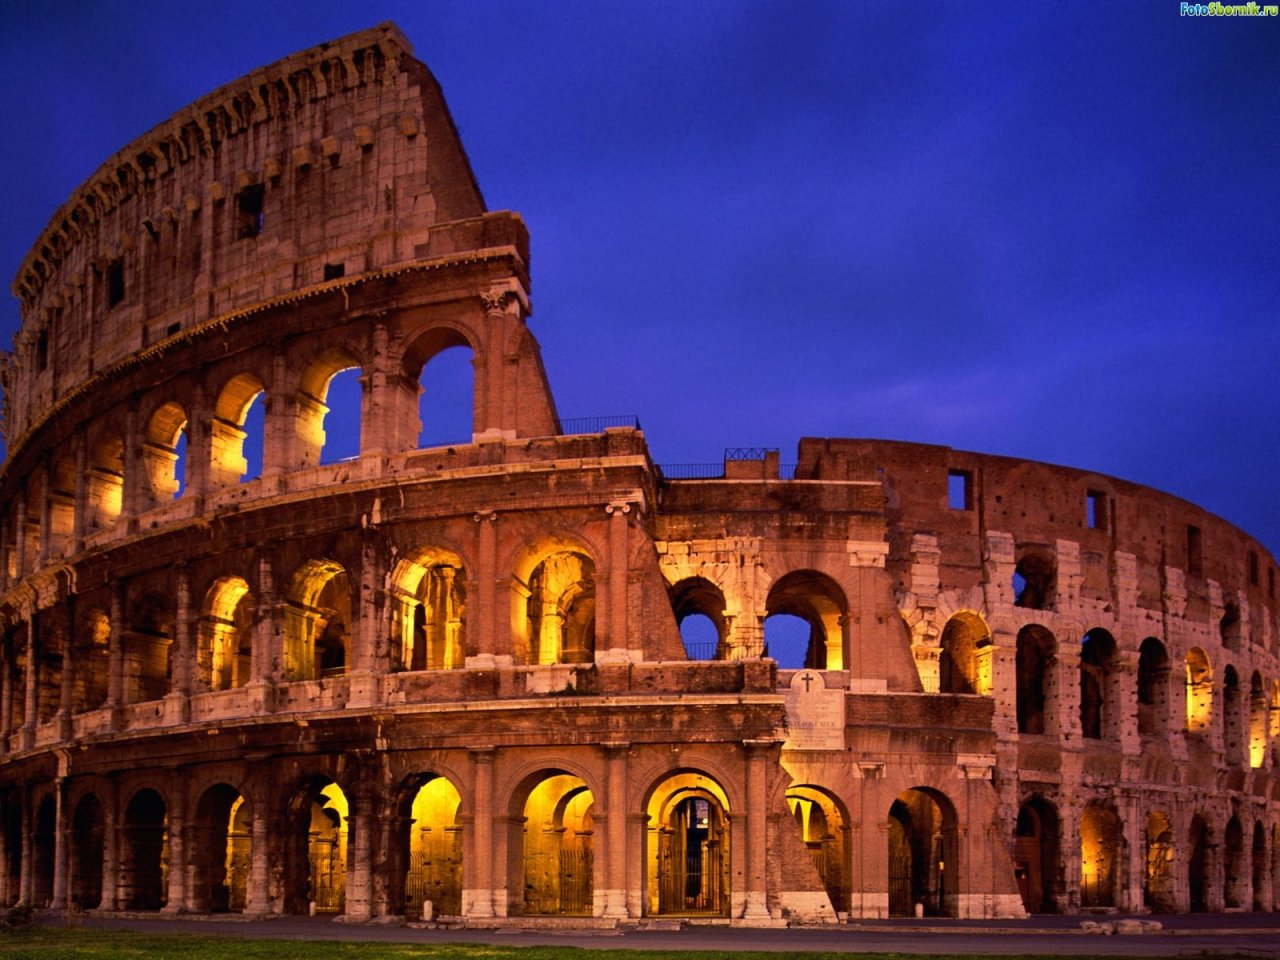 10-interesnyh-faktov-pro-Italiju